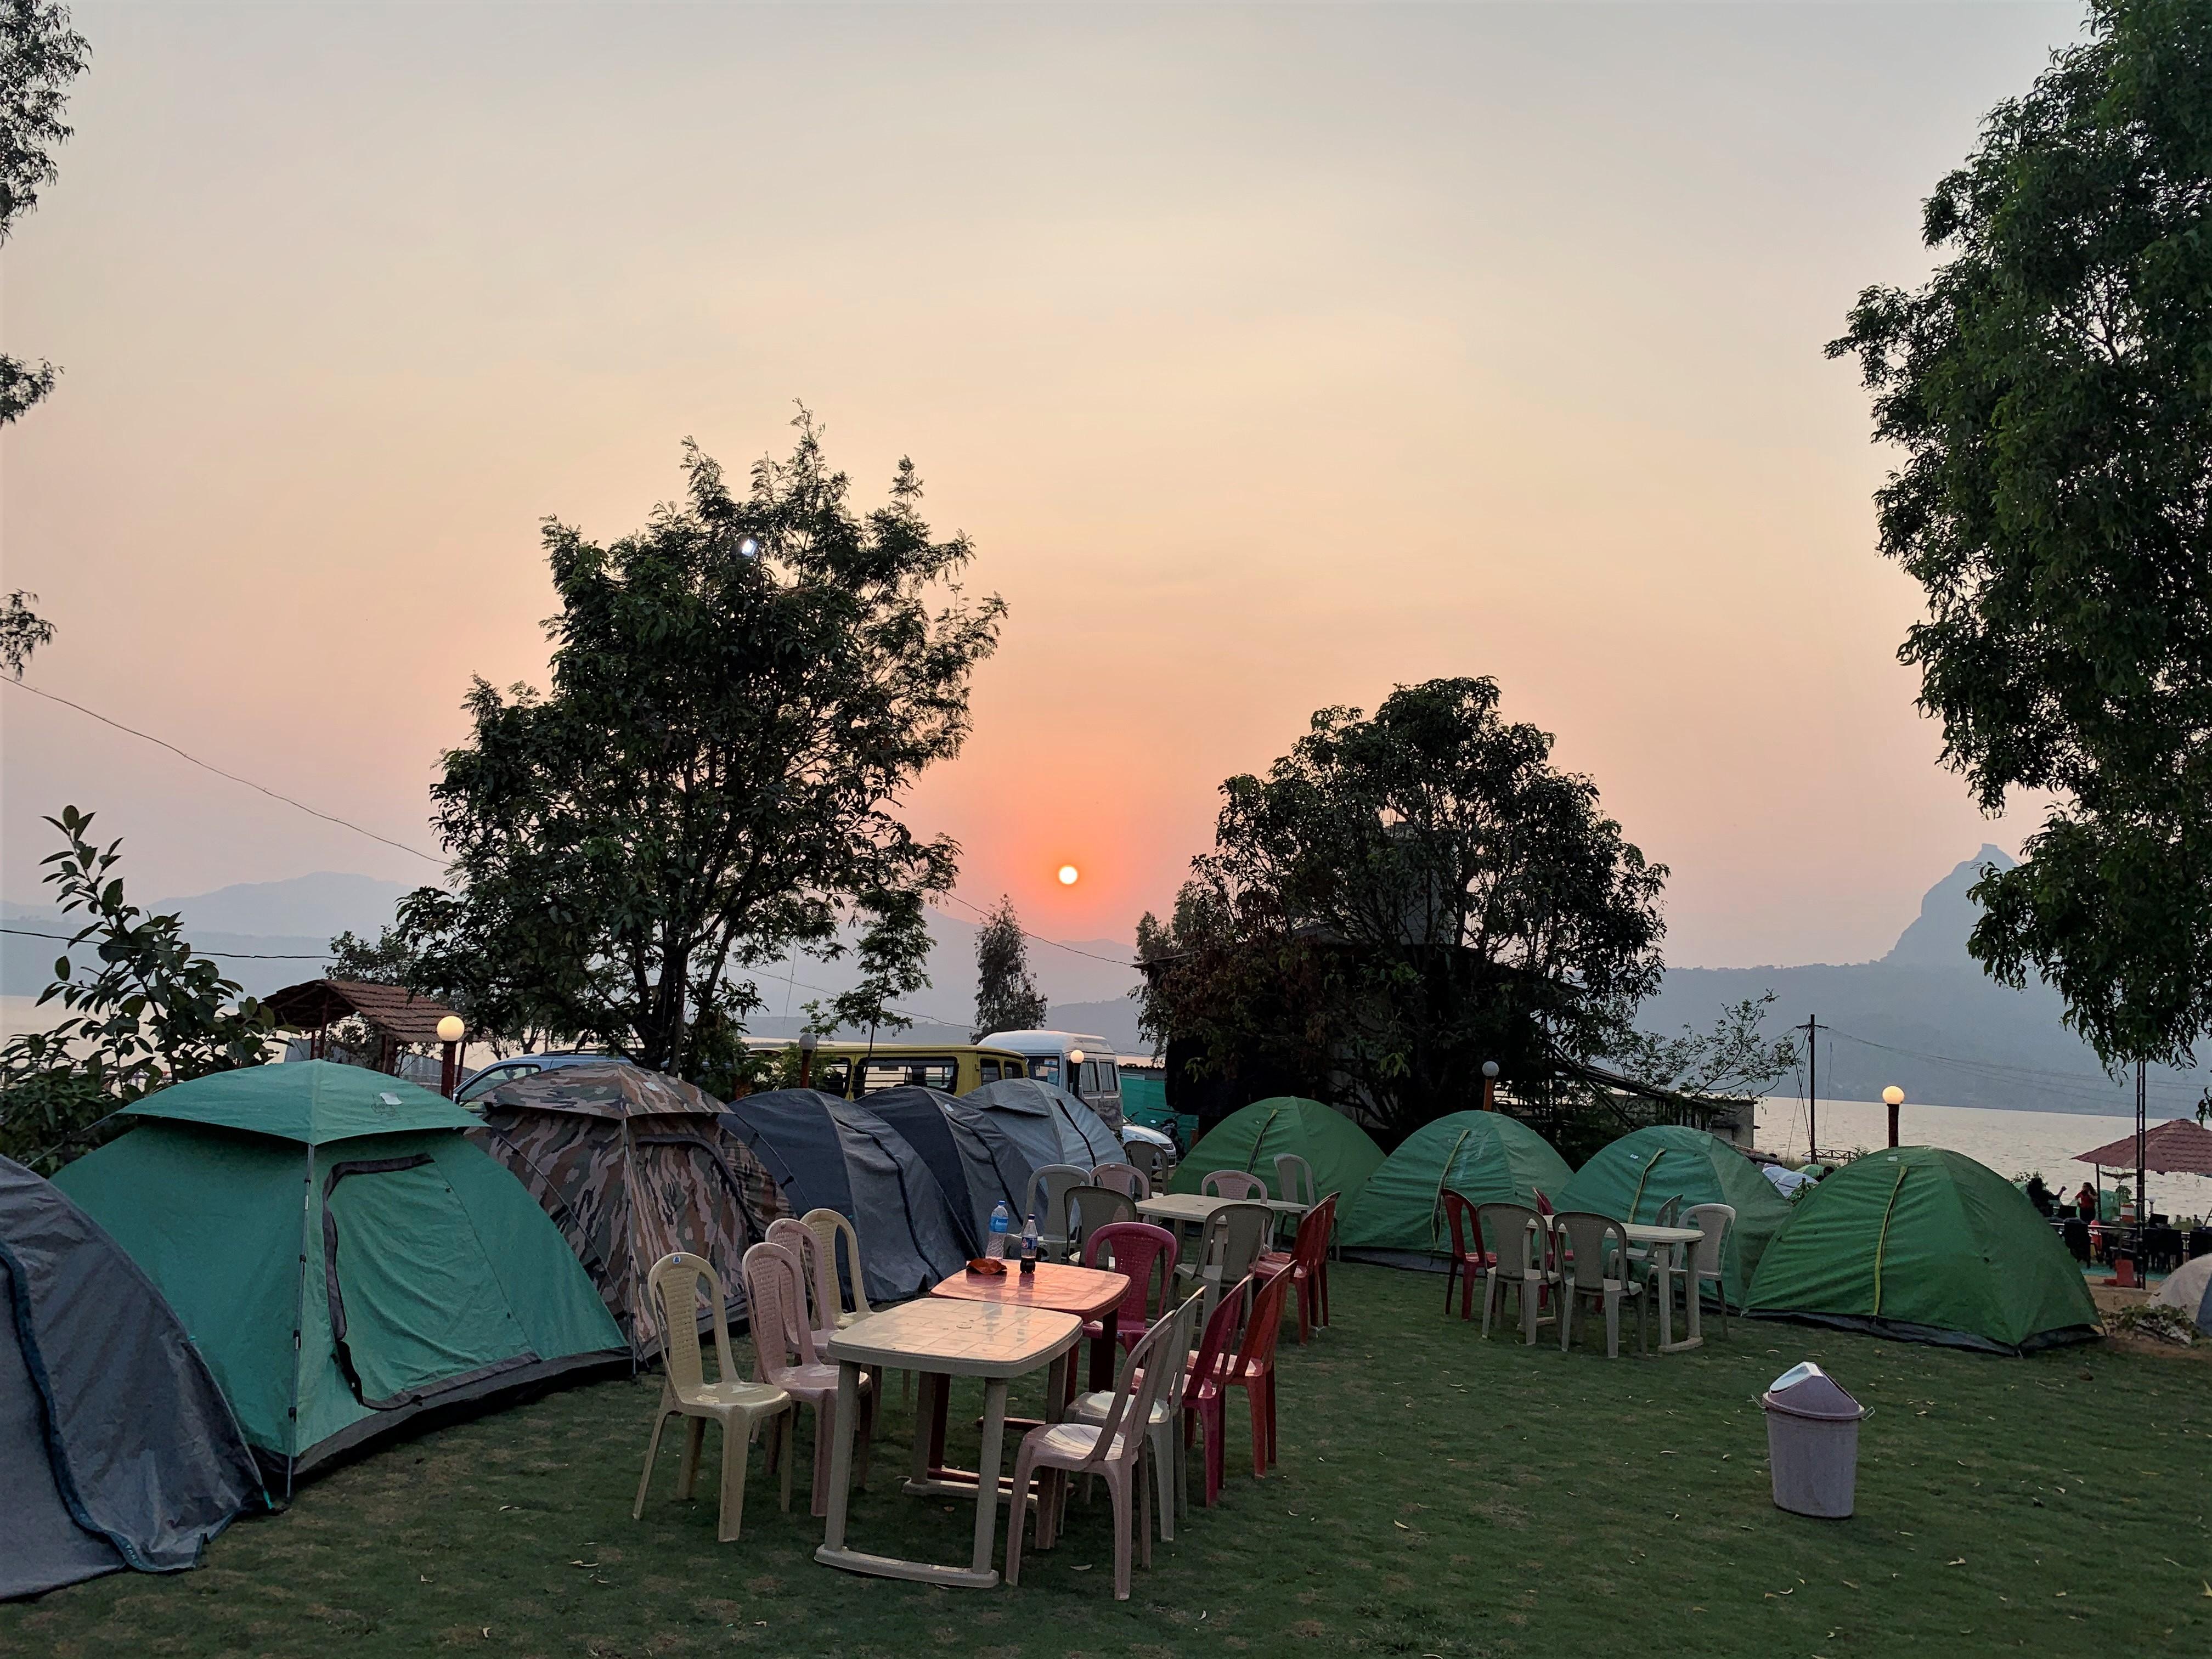 Camping_in_Maharashtra_TravellersofIndia